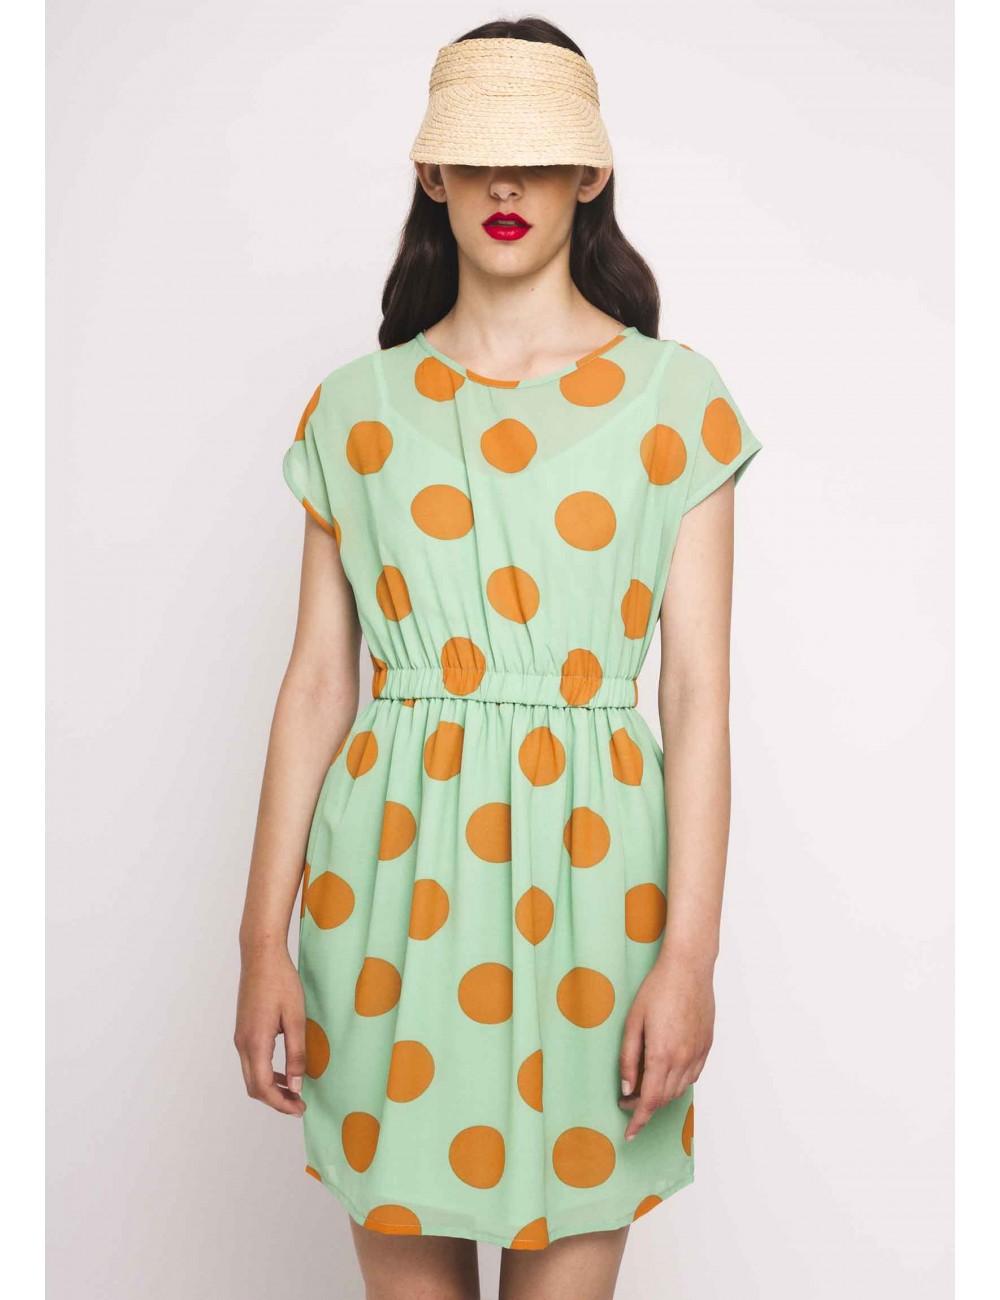 COMPANIA FANTASTICA - Γυναικεία Φορέματα  a998ec85f61